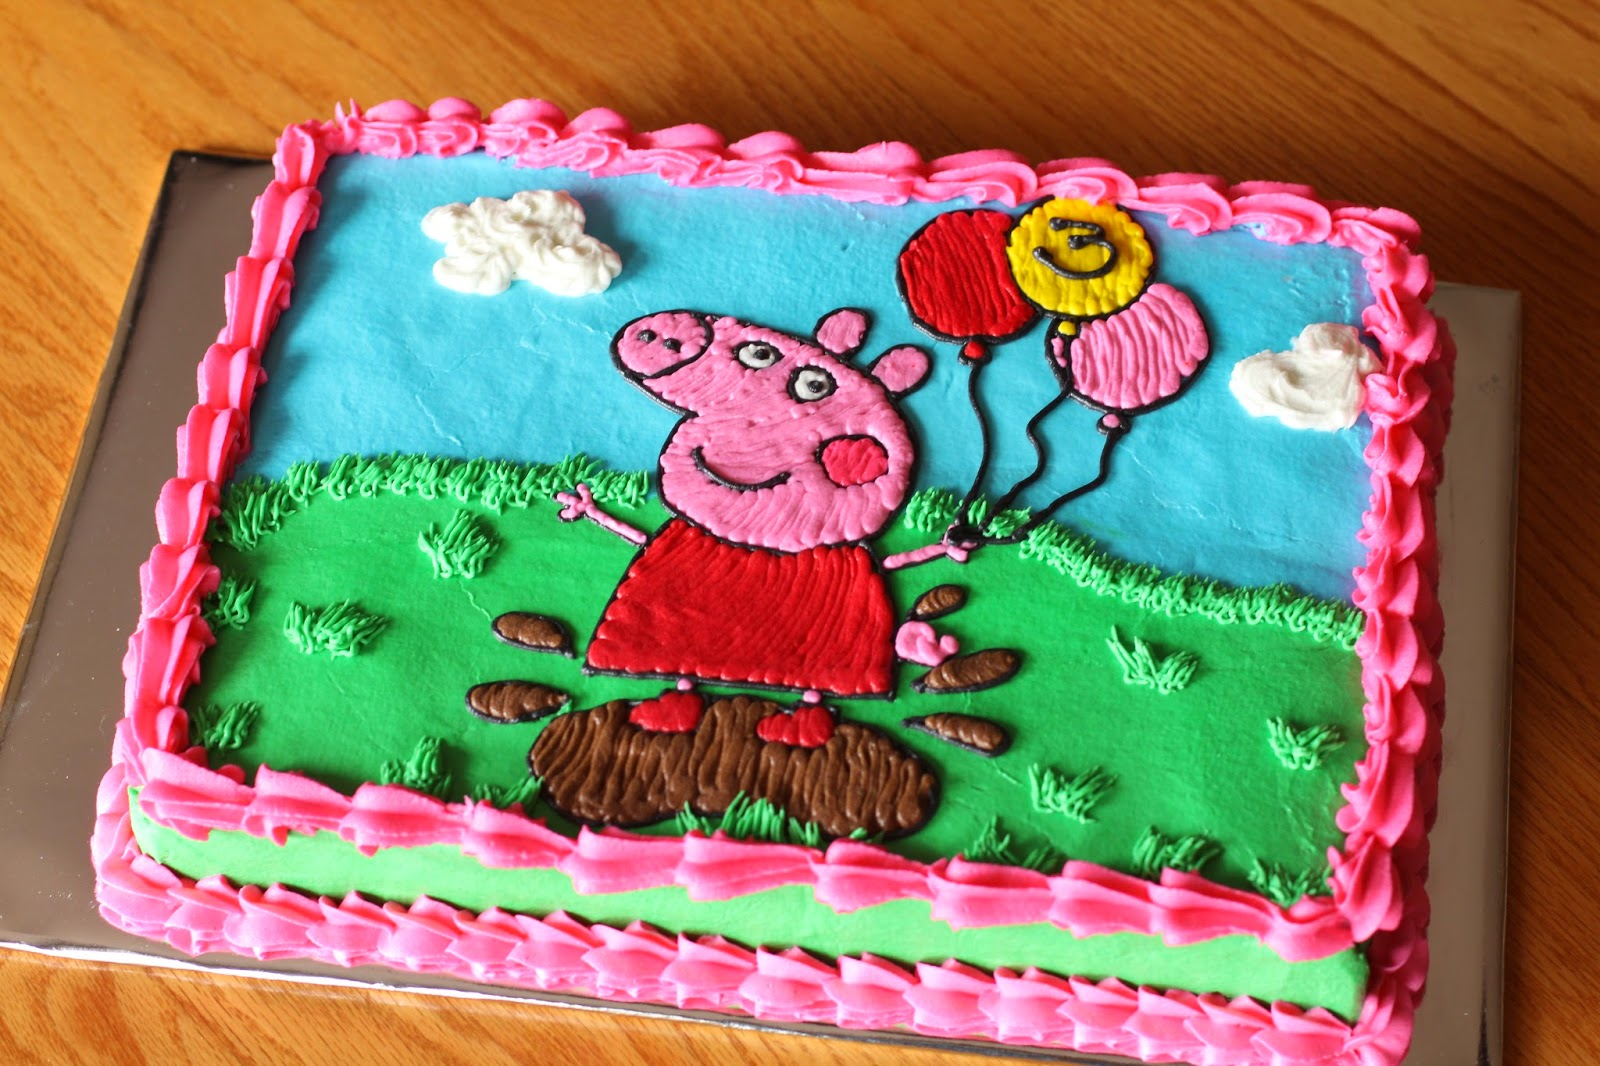 The Ganos Happy 3rd Bithday Peppa Pig Sheet Cake